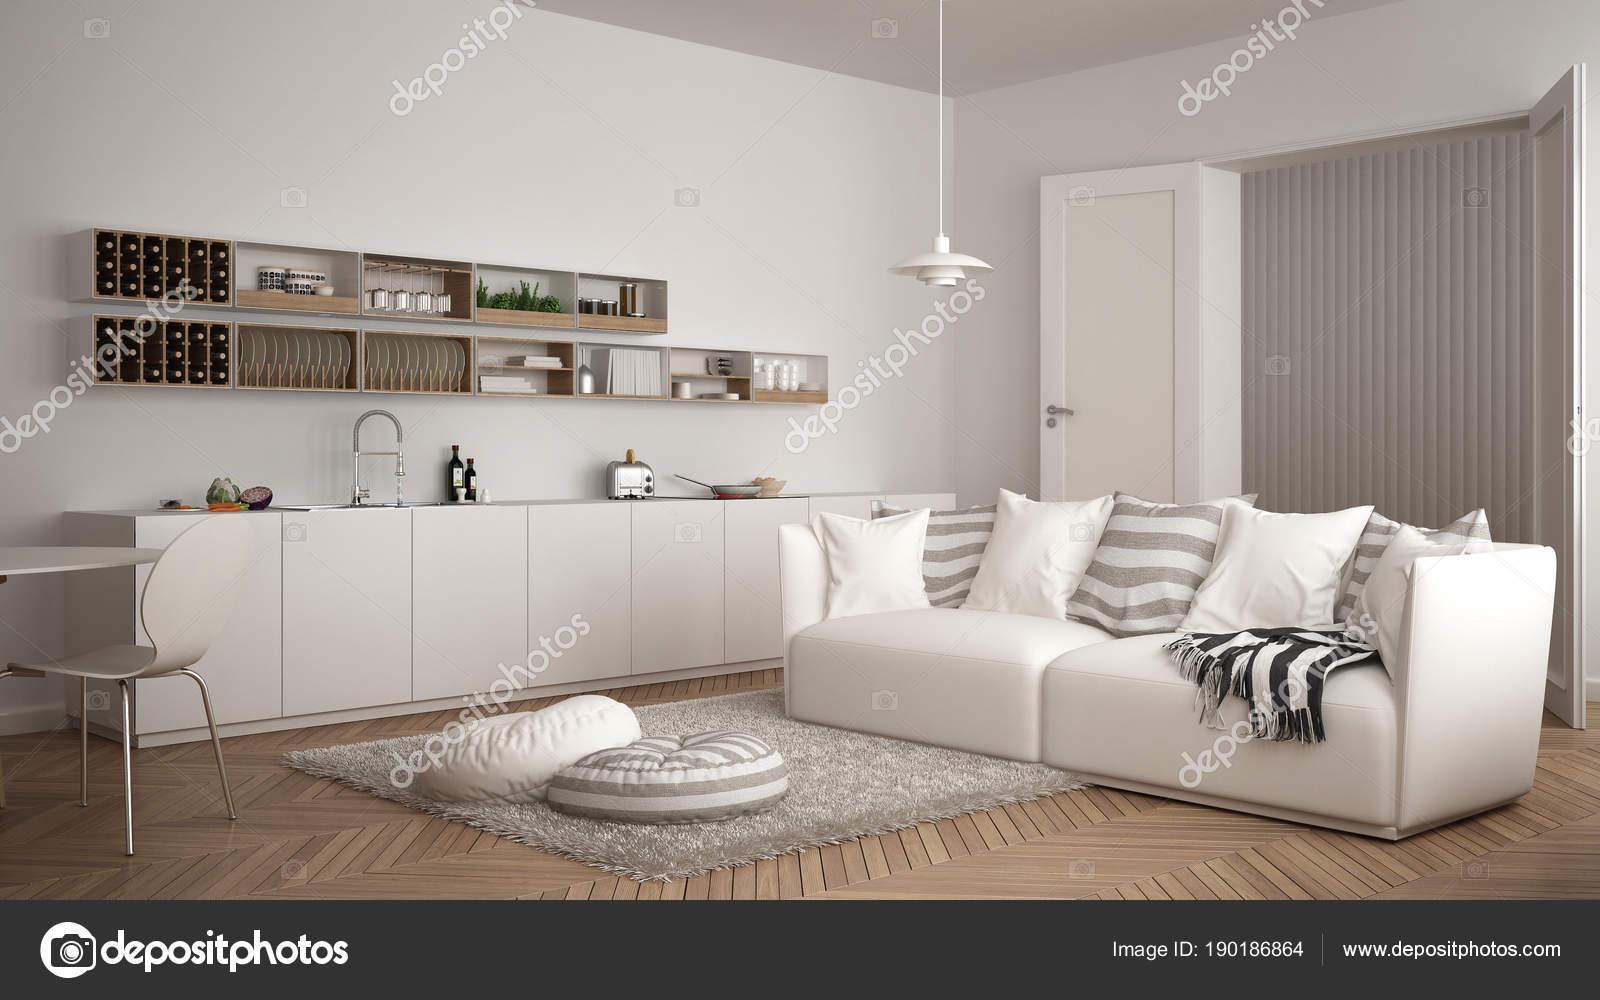 Escandinava moderna sala con cocina, mesa comedor, sofá y ...